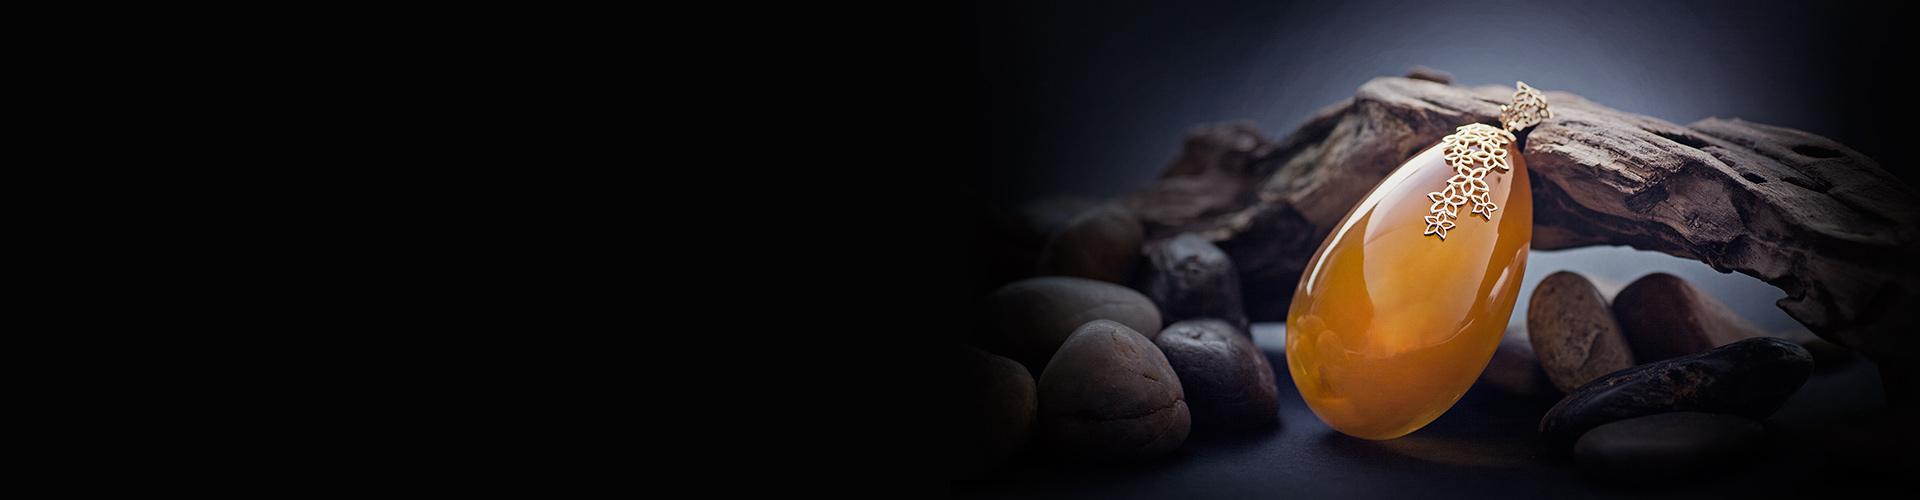 ArsenAmber-Background-1920x500px